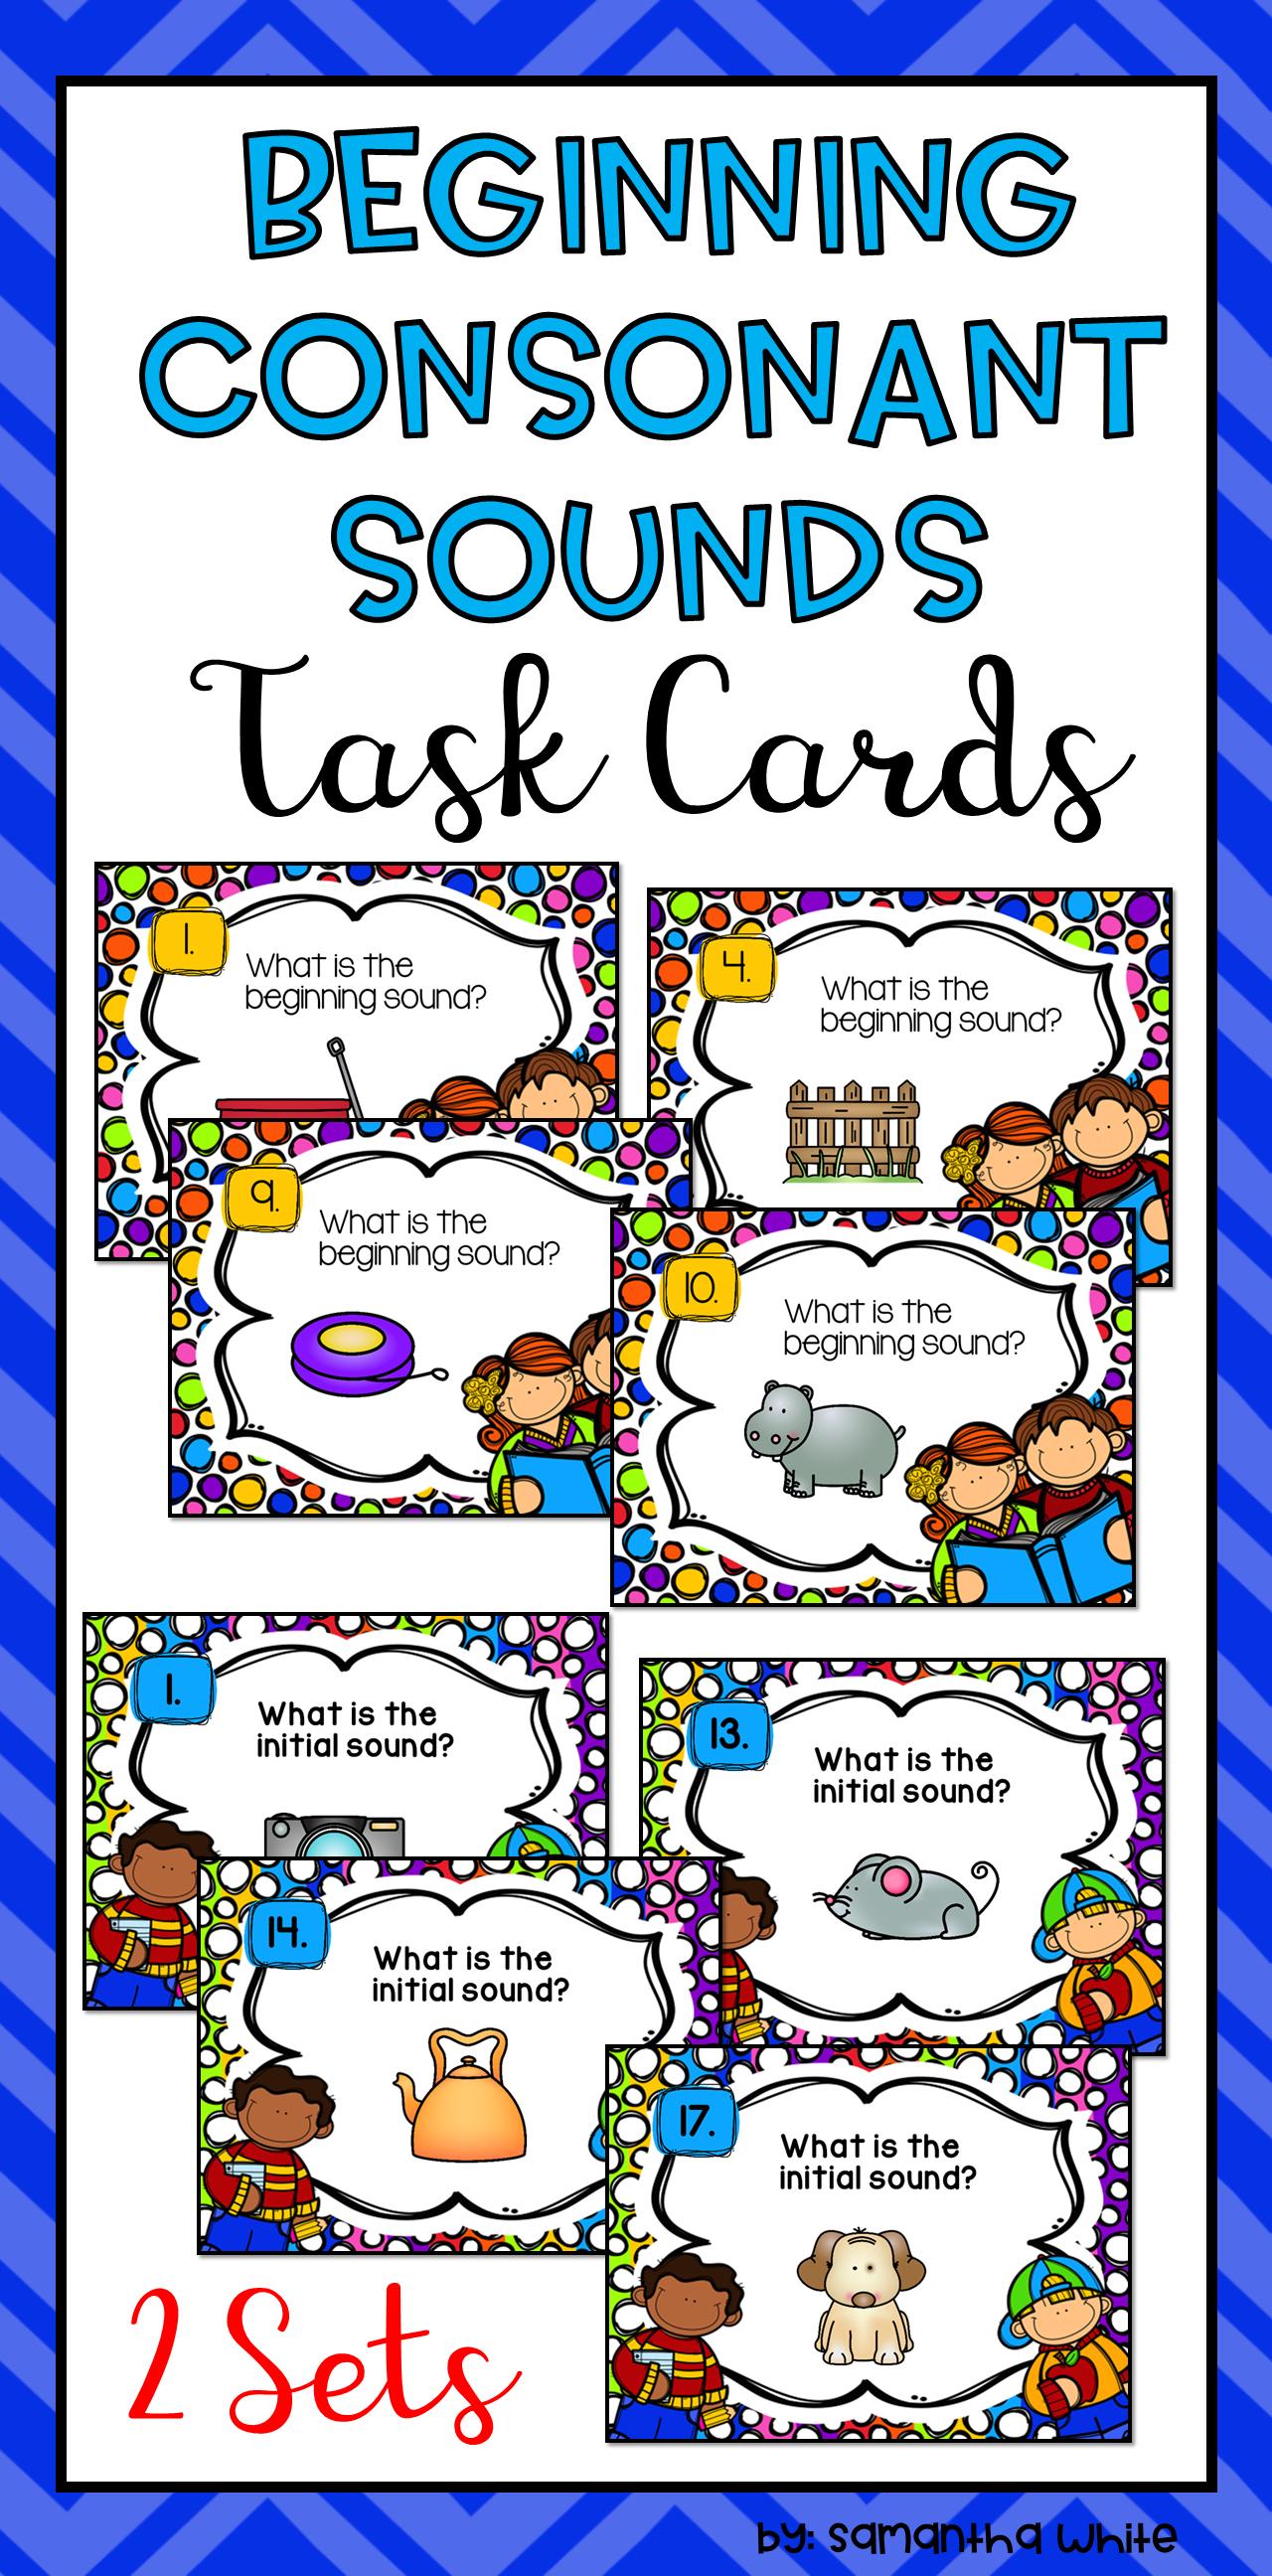 Beginning Consonant Sounds Task Cards